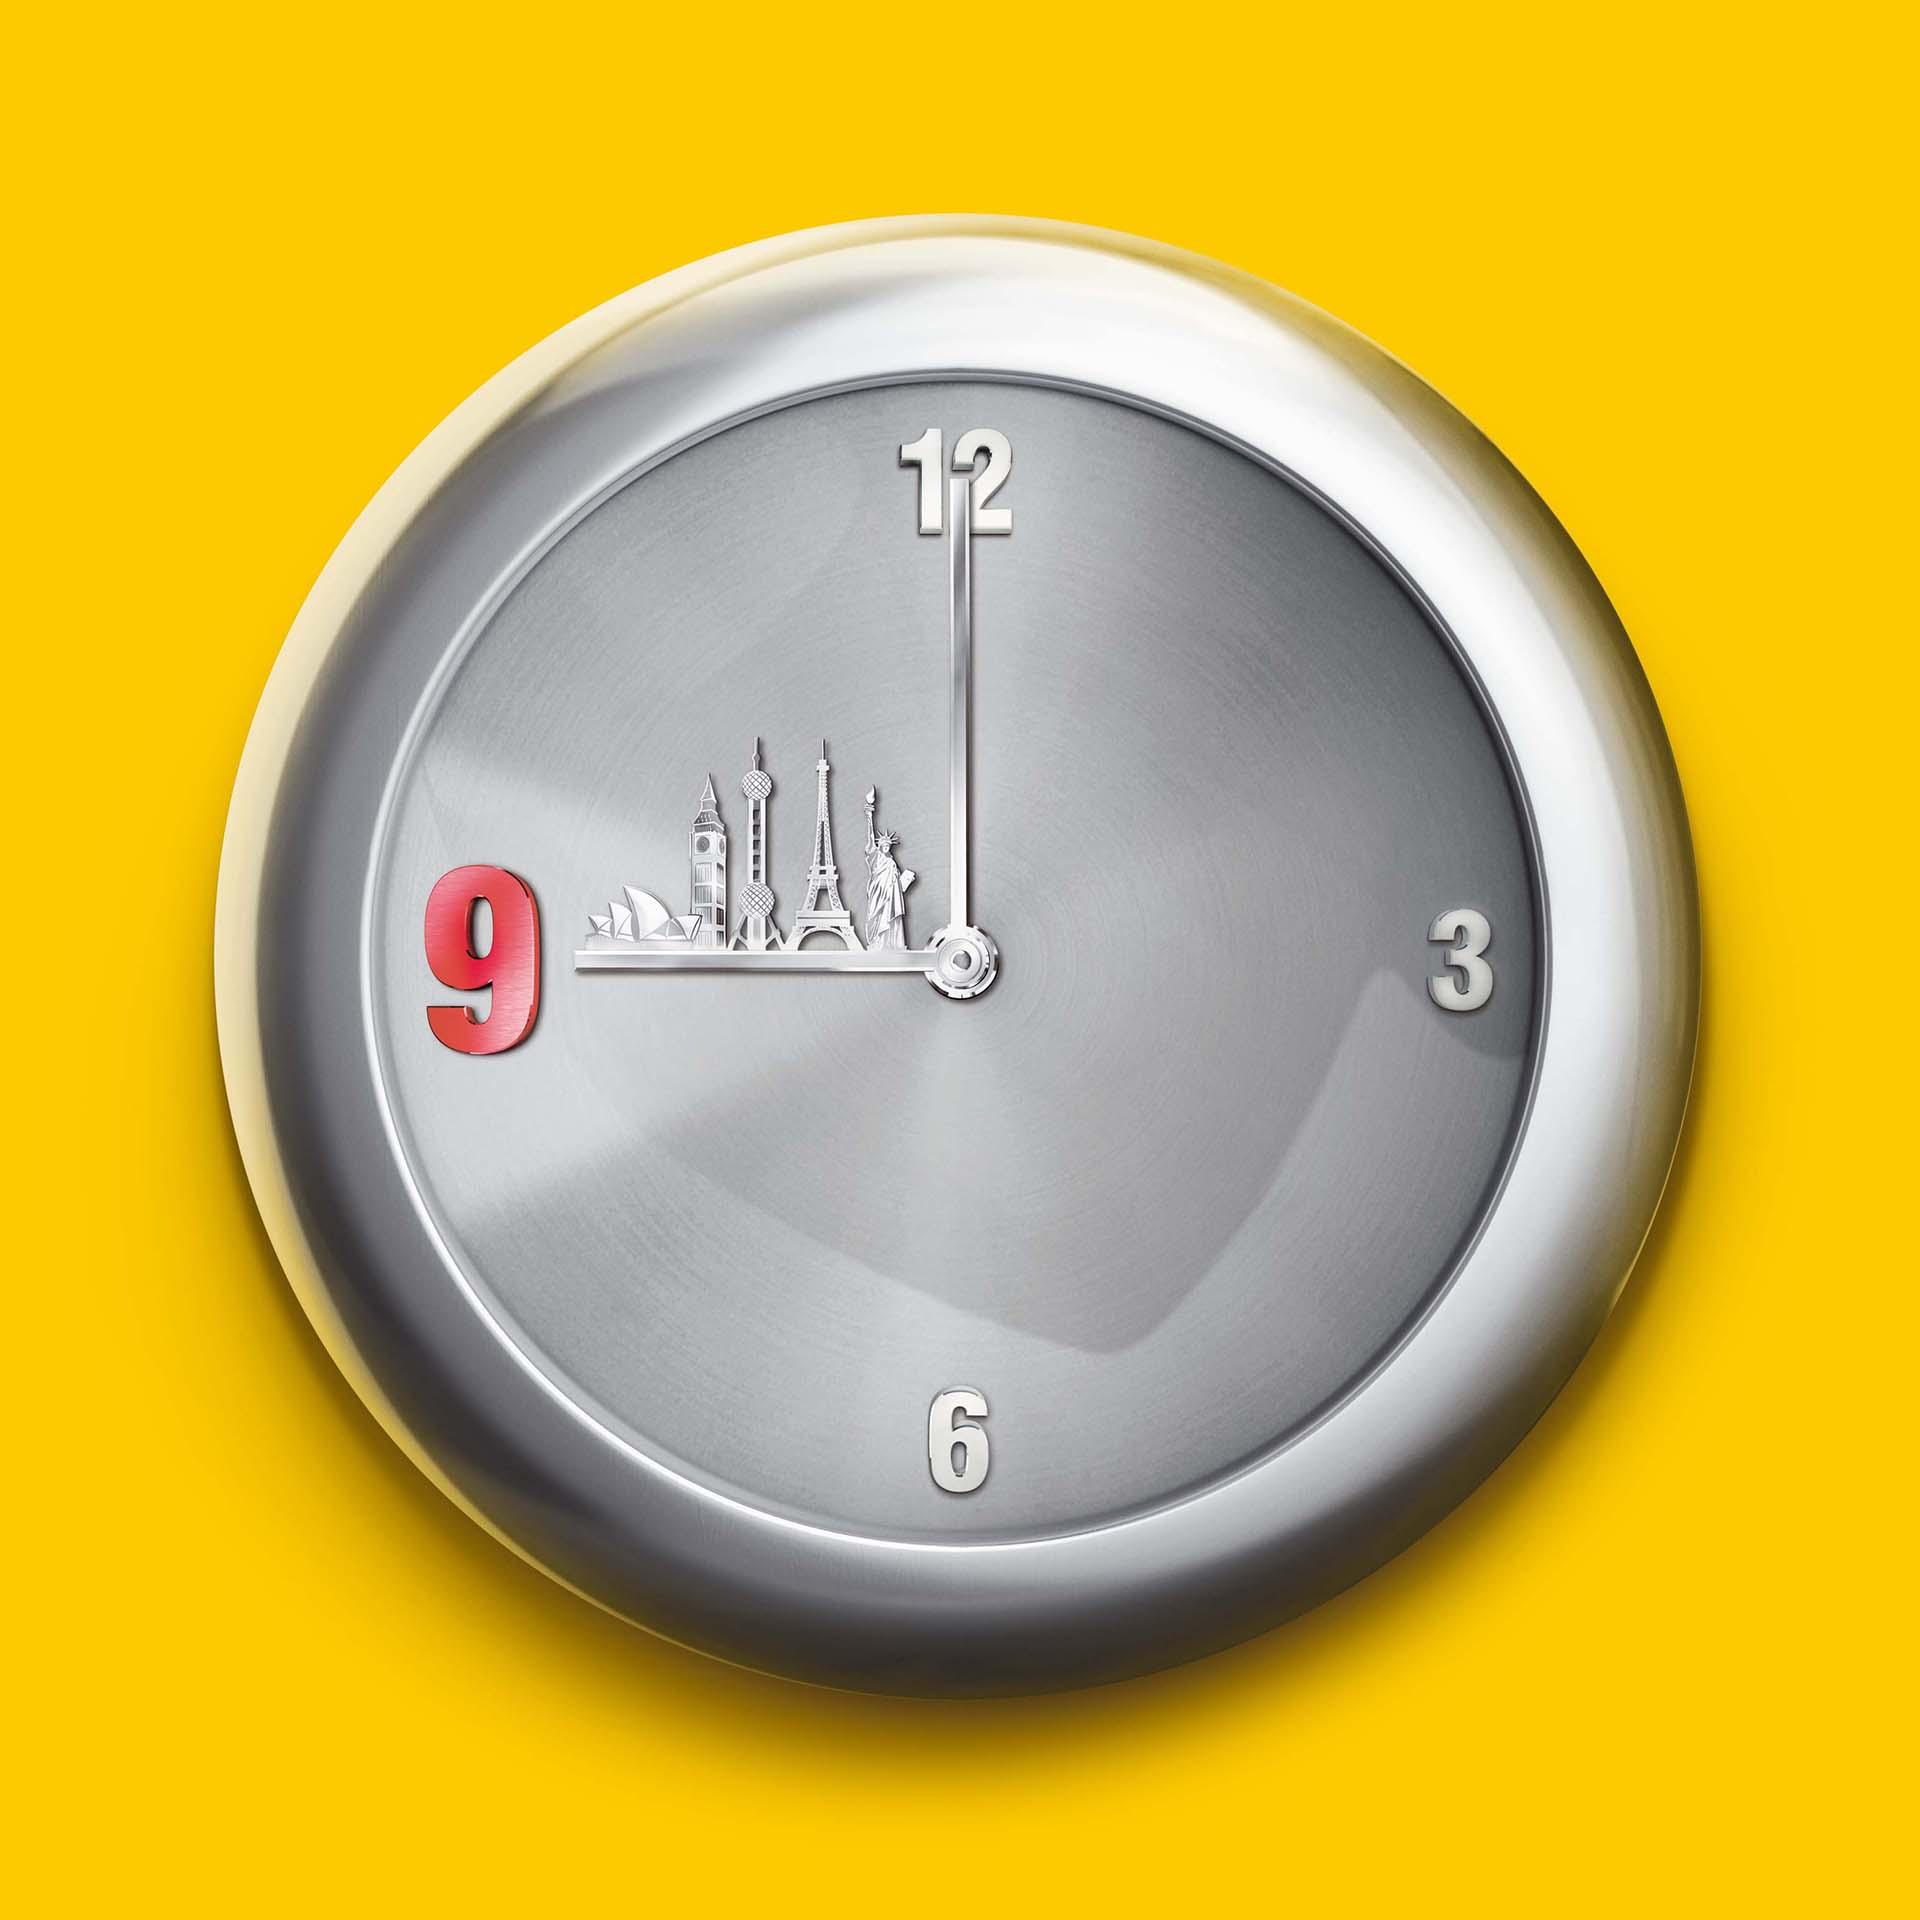 002 DHL_Clock_9a_layers copy